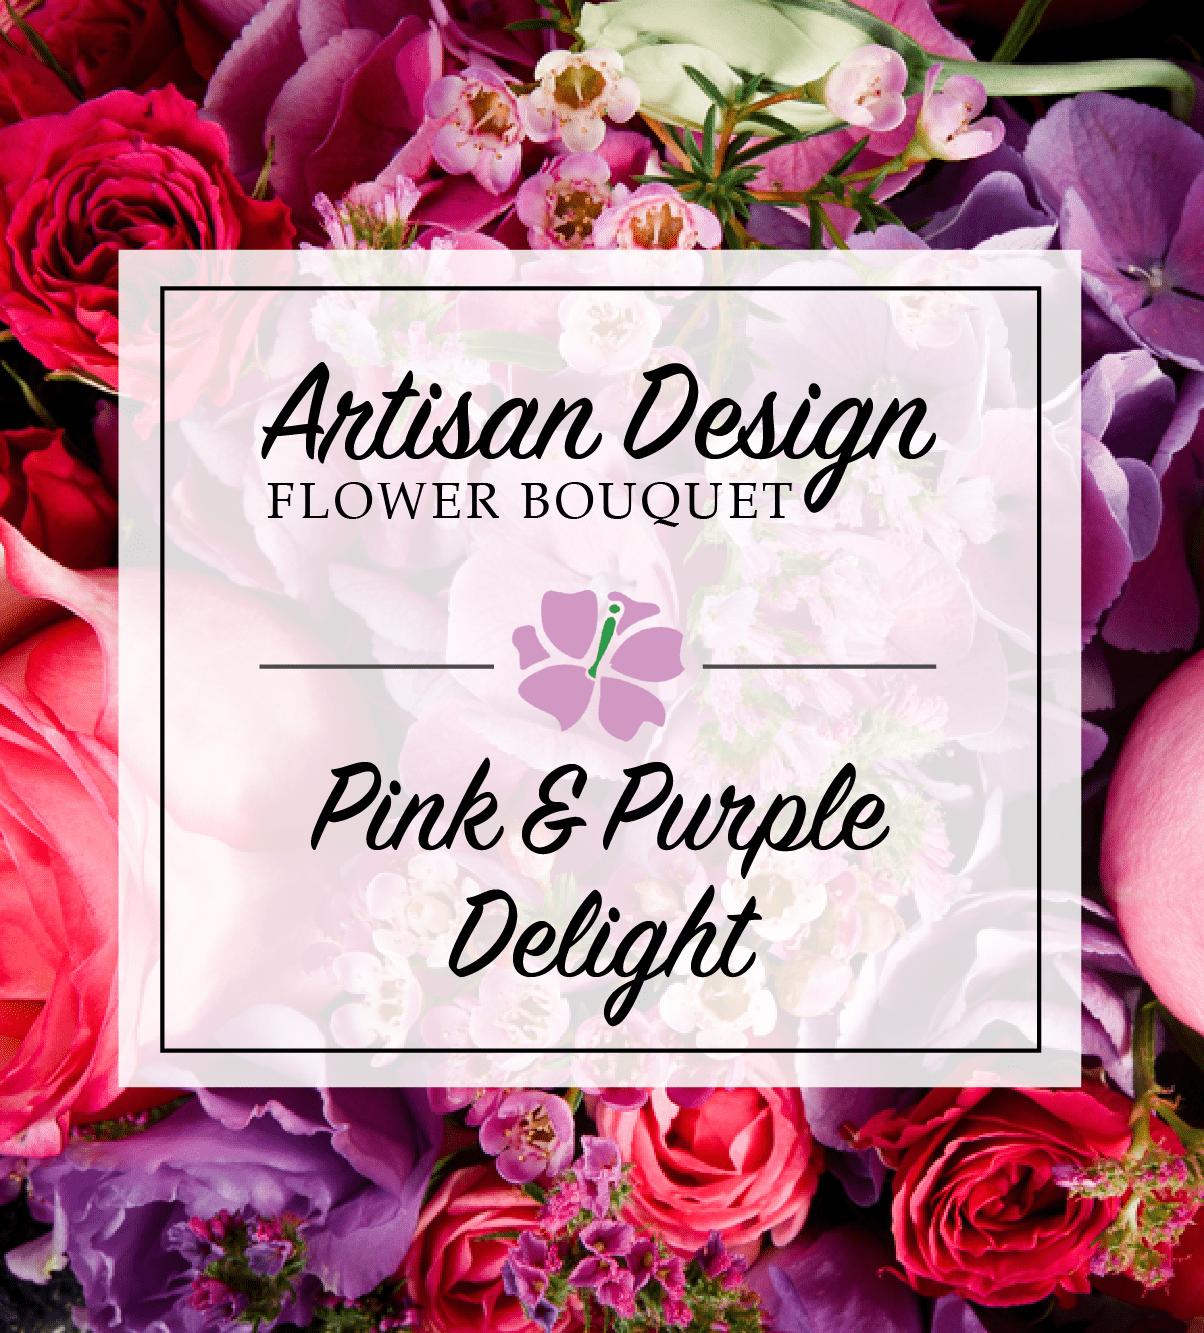 Artist's Design: Pink & Purple Delight